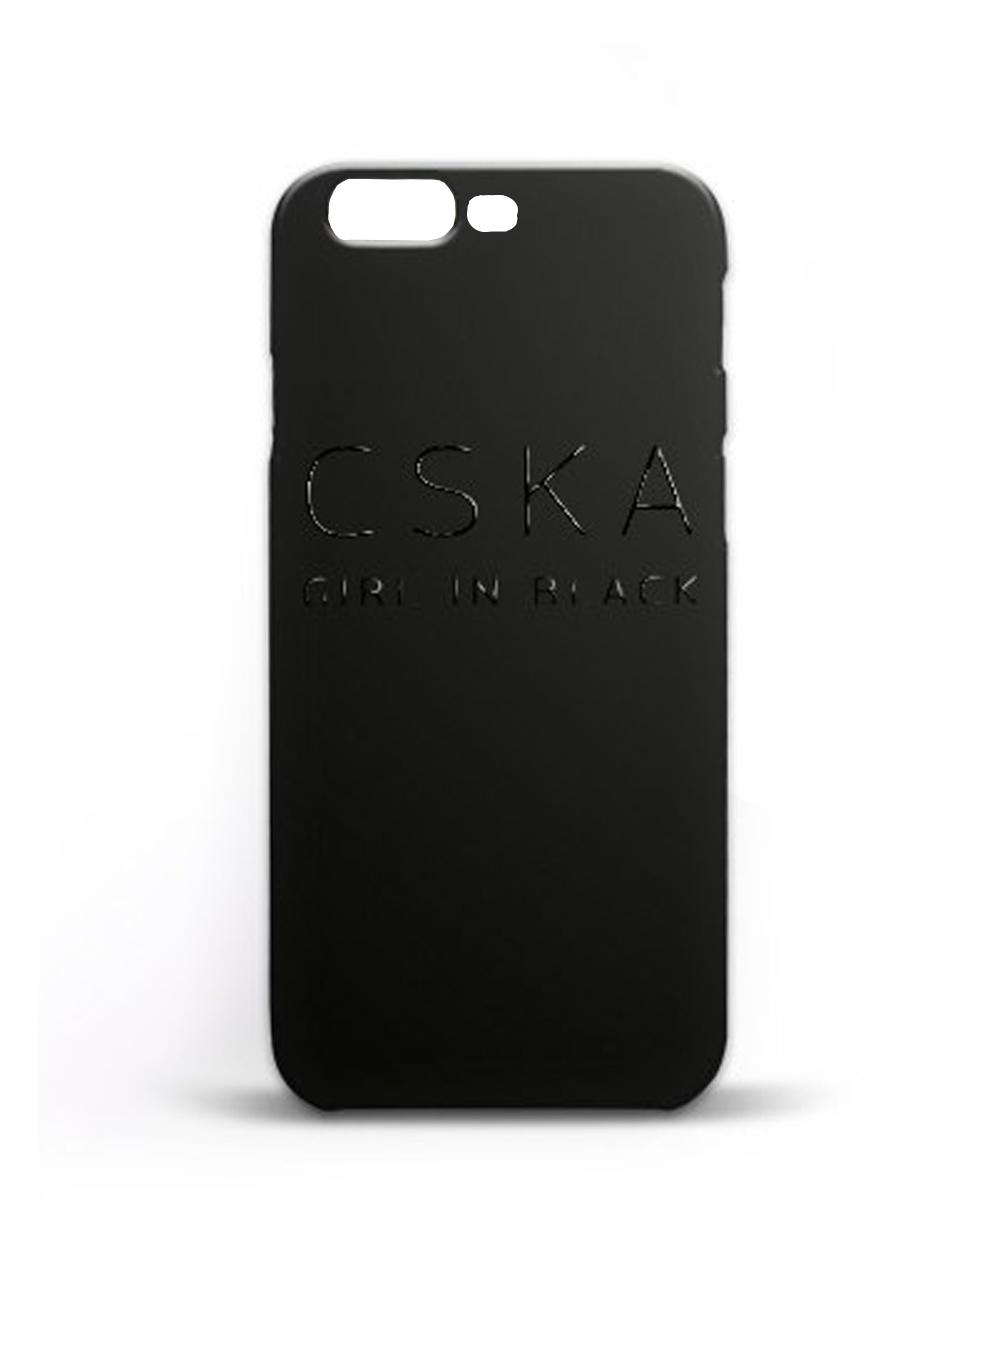 Клип-кейс CSKA GIRL IN BLACKдля iPhone 7 Plus, цвет чёрный